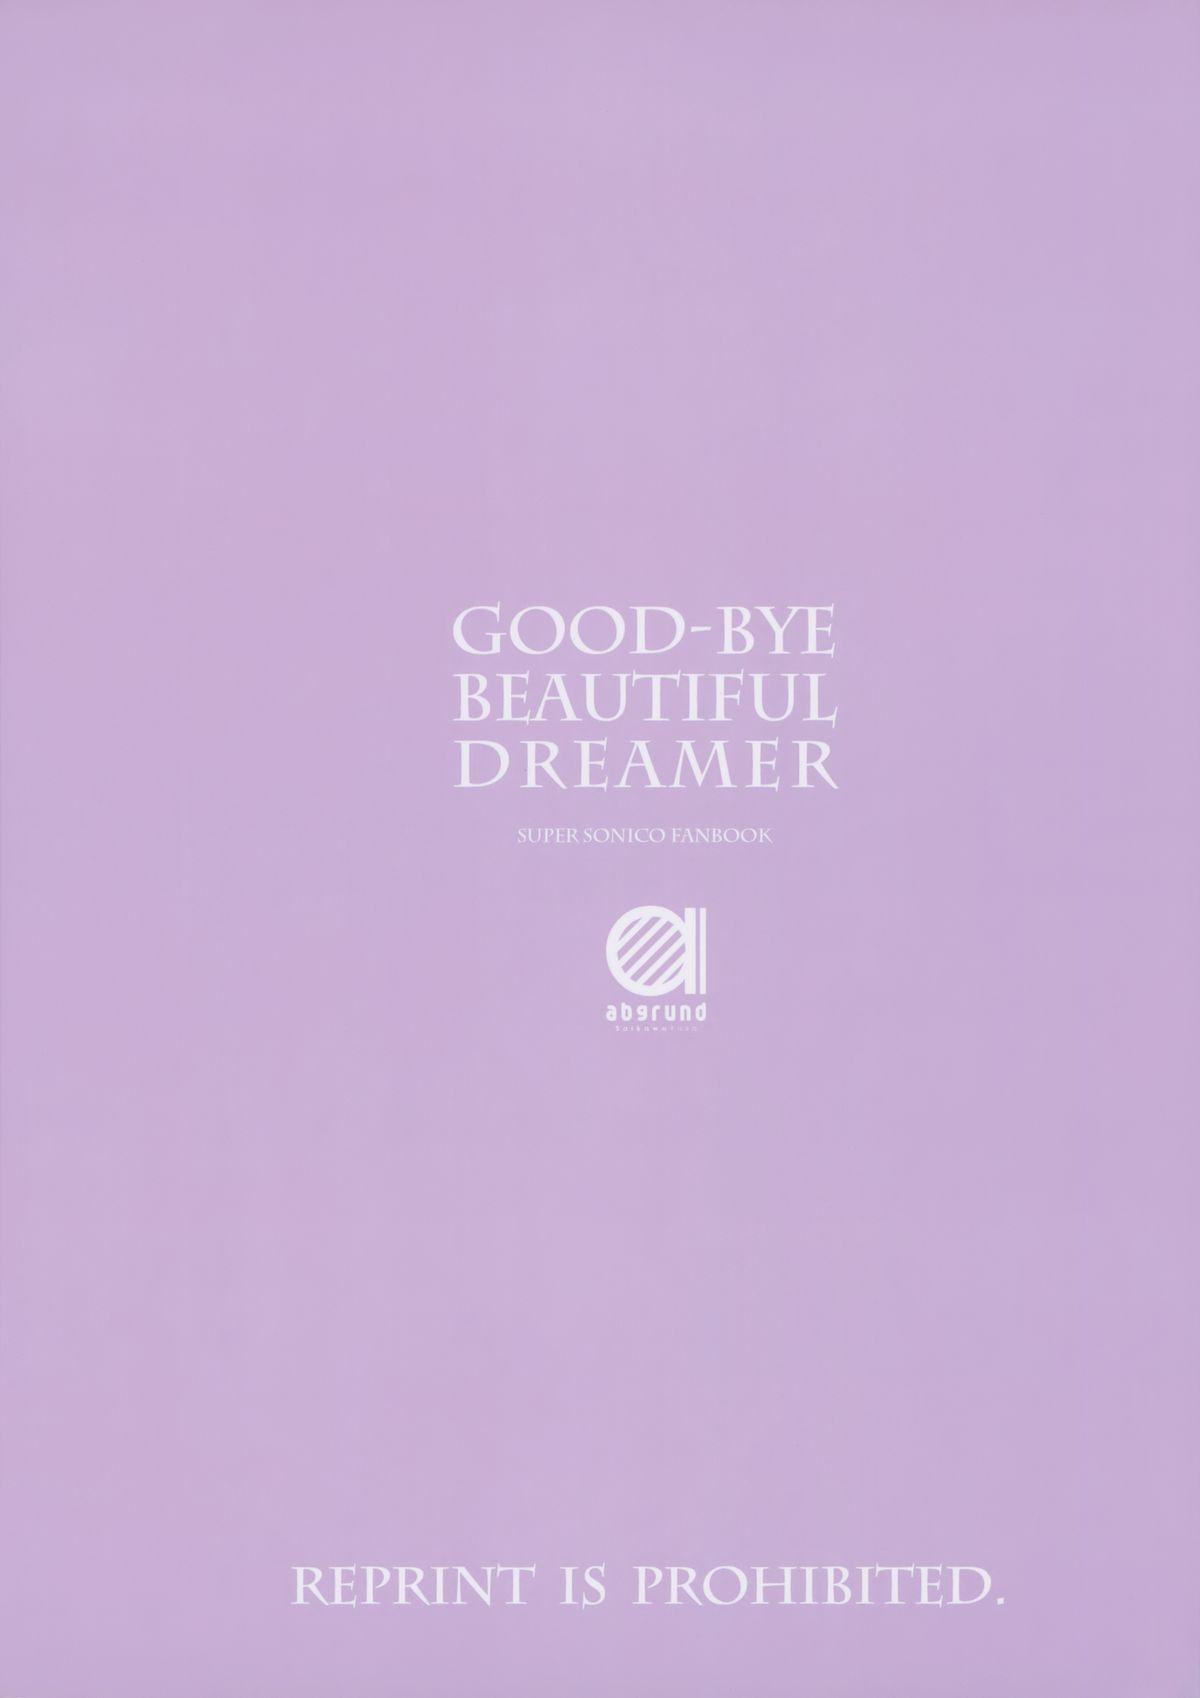 GOOD-BYE BEAUTIFUL DREAMER 21